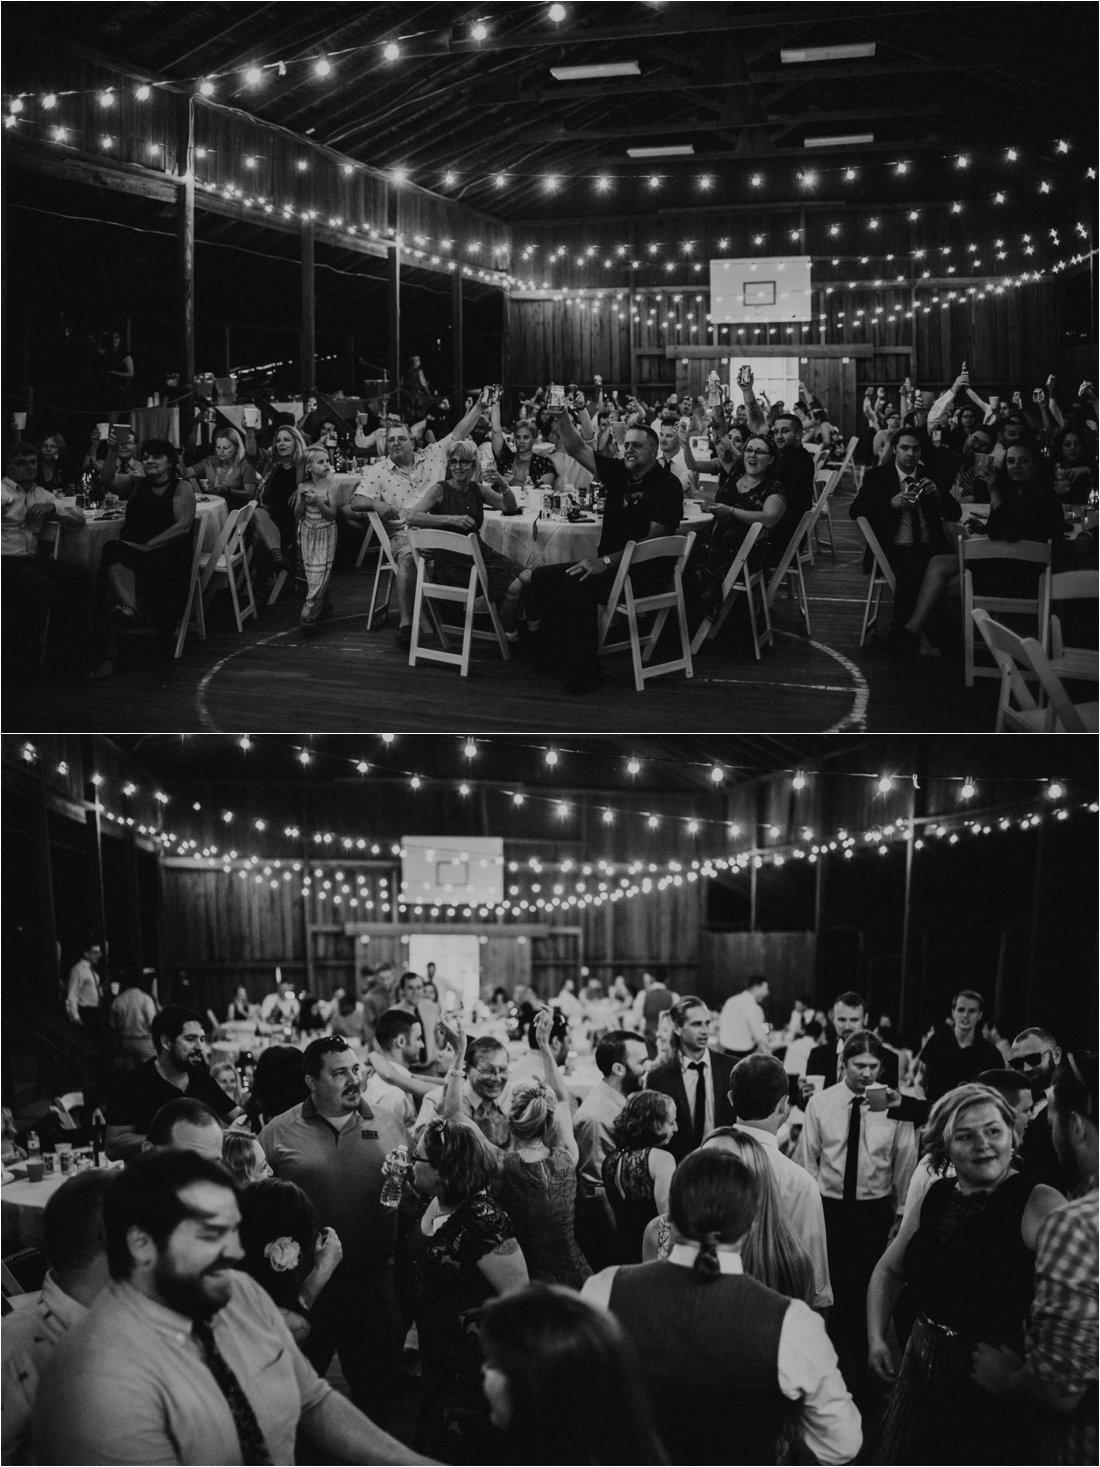 echo-oscar-camp-pinnacle-asheville-hendersonville-nc-wedding_0041.jpg